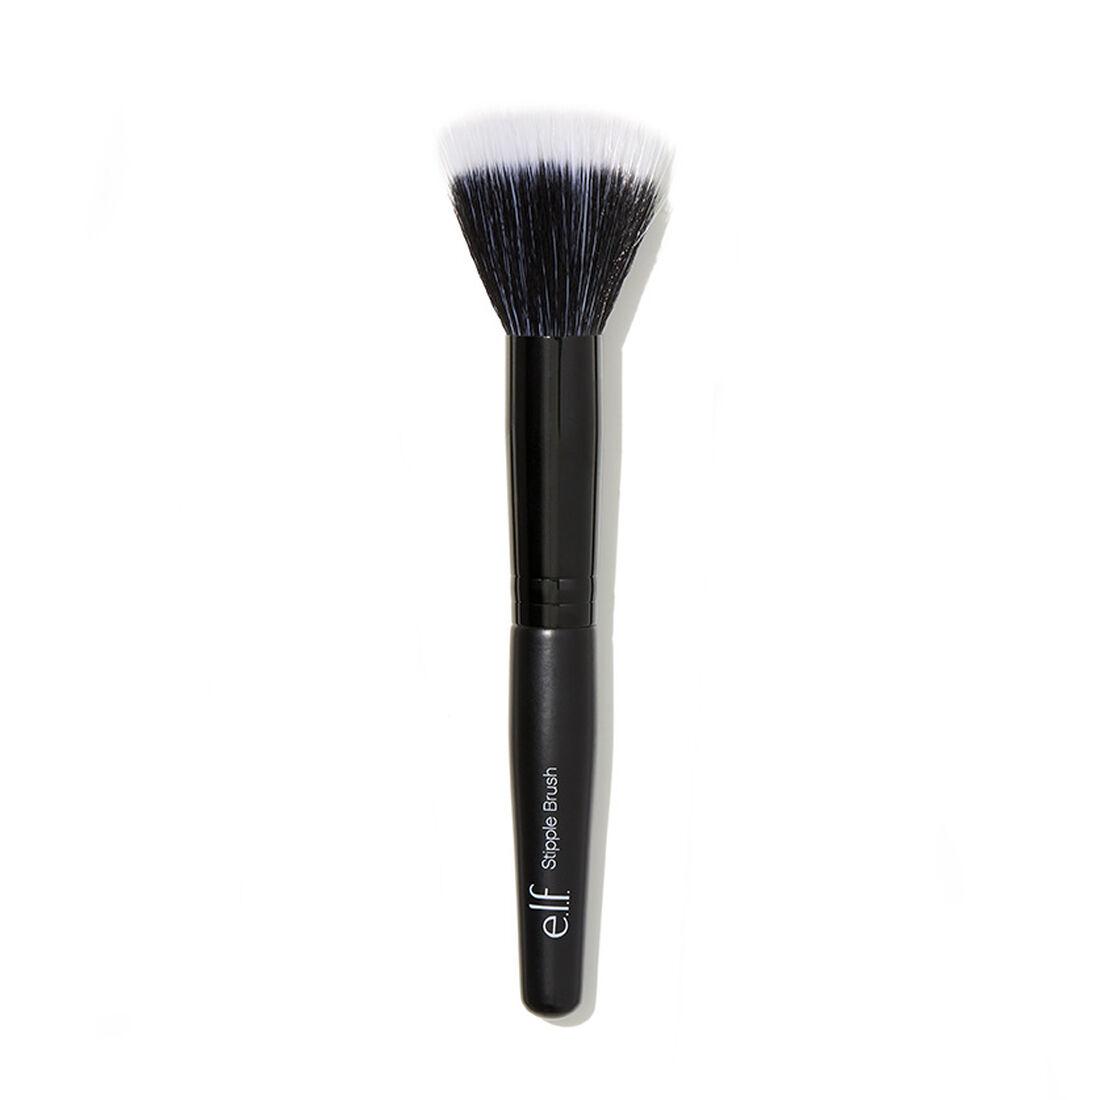 e.l.f. Cosmetics - Stipple Brush